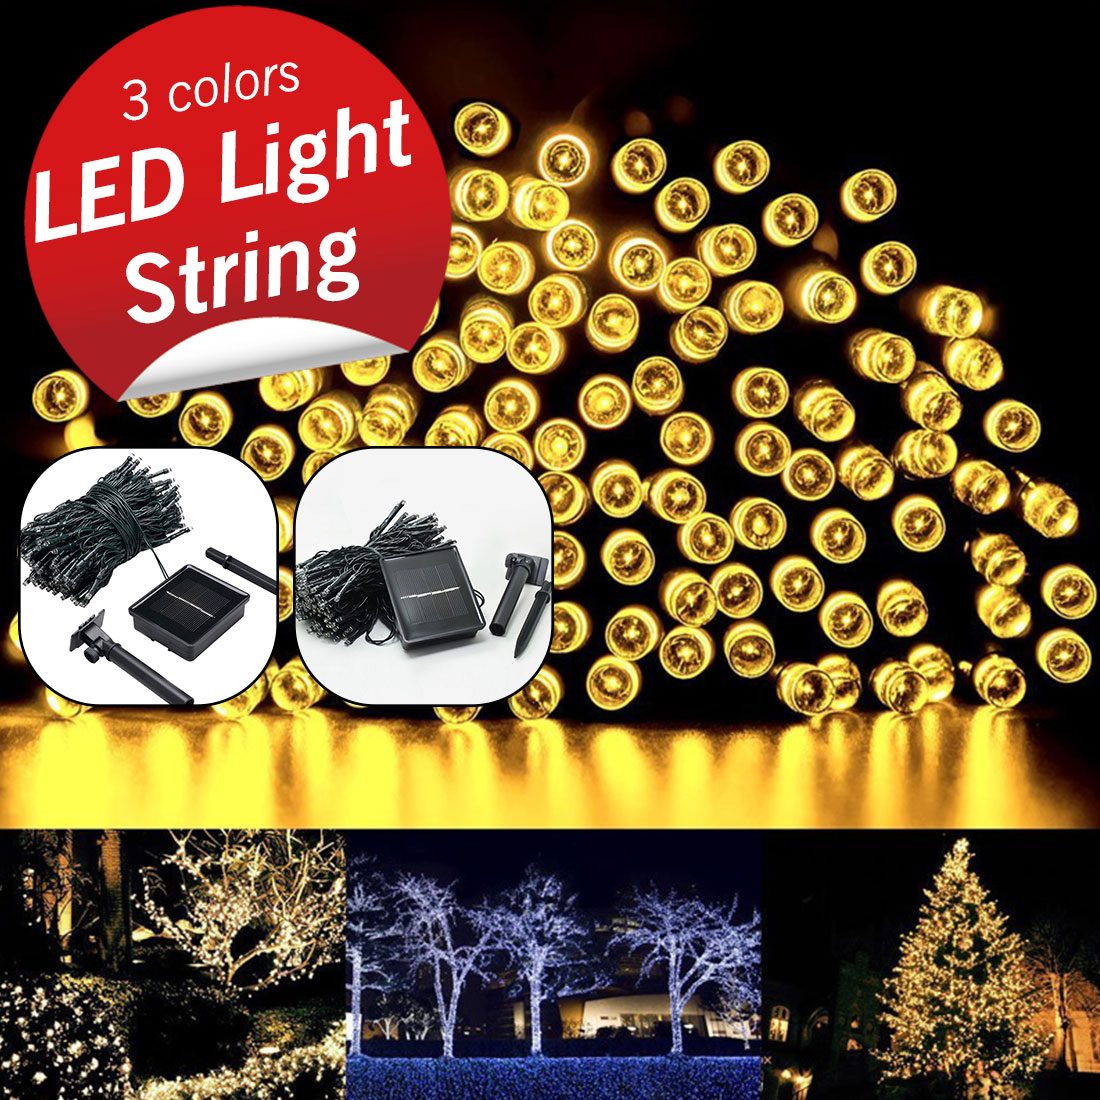 Lights & Lighting Fairy Light 7m/12m/22m Waterproof Solar Powered Light Christmas Street Garland Led String Strip Light Outdoor For Garden Wedding Pure White And Translucent Led Lighting